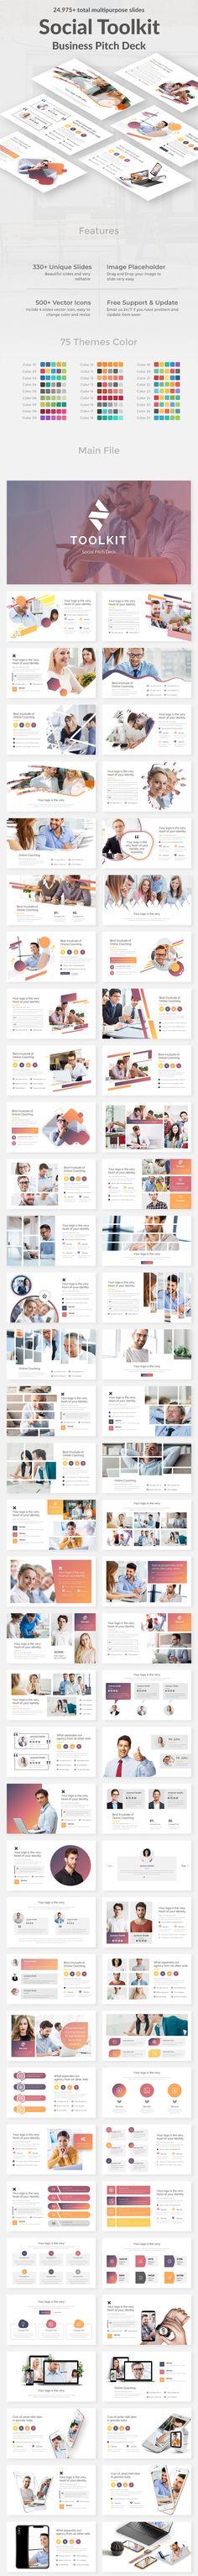 Social Toolkit Pitch Deck Google Slide Template Marketing Presentation, Business Presentation Templates, Corporate Presentation, Presentation Slides, Business Templates, Pitch Deck, Creative Powerpoint Templates, Keynote Template, Photoshop